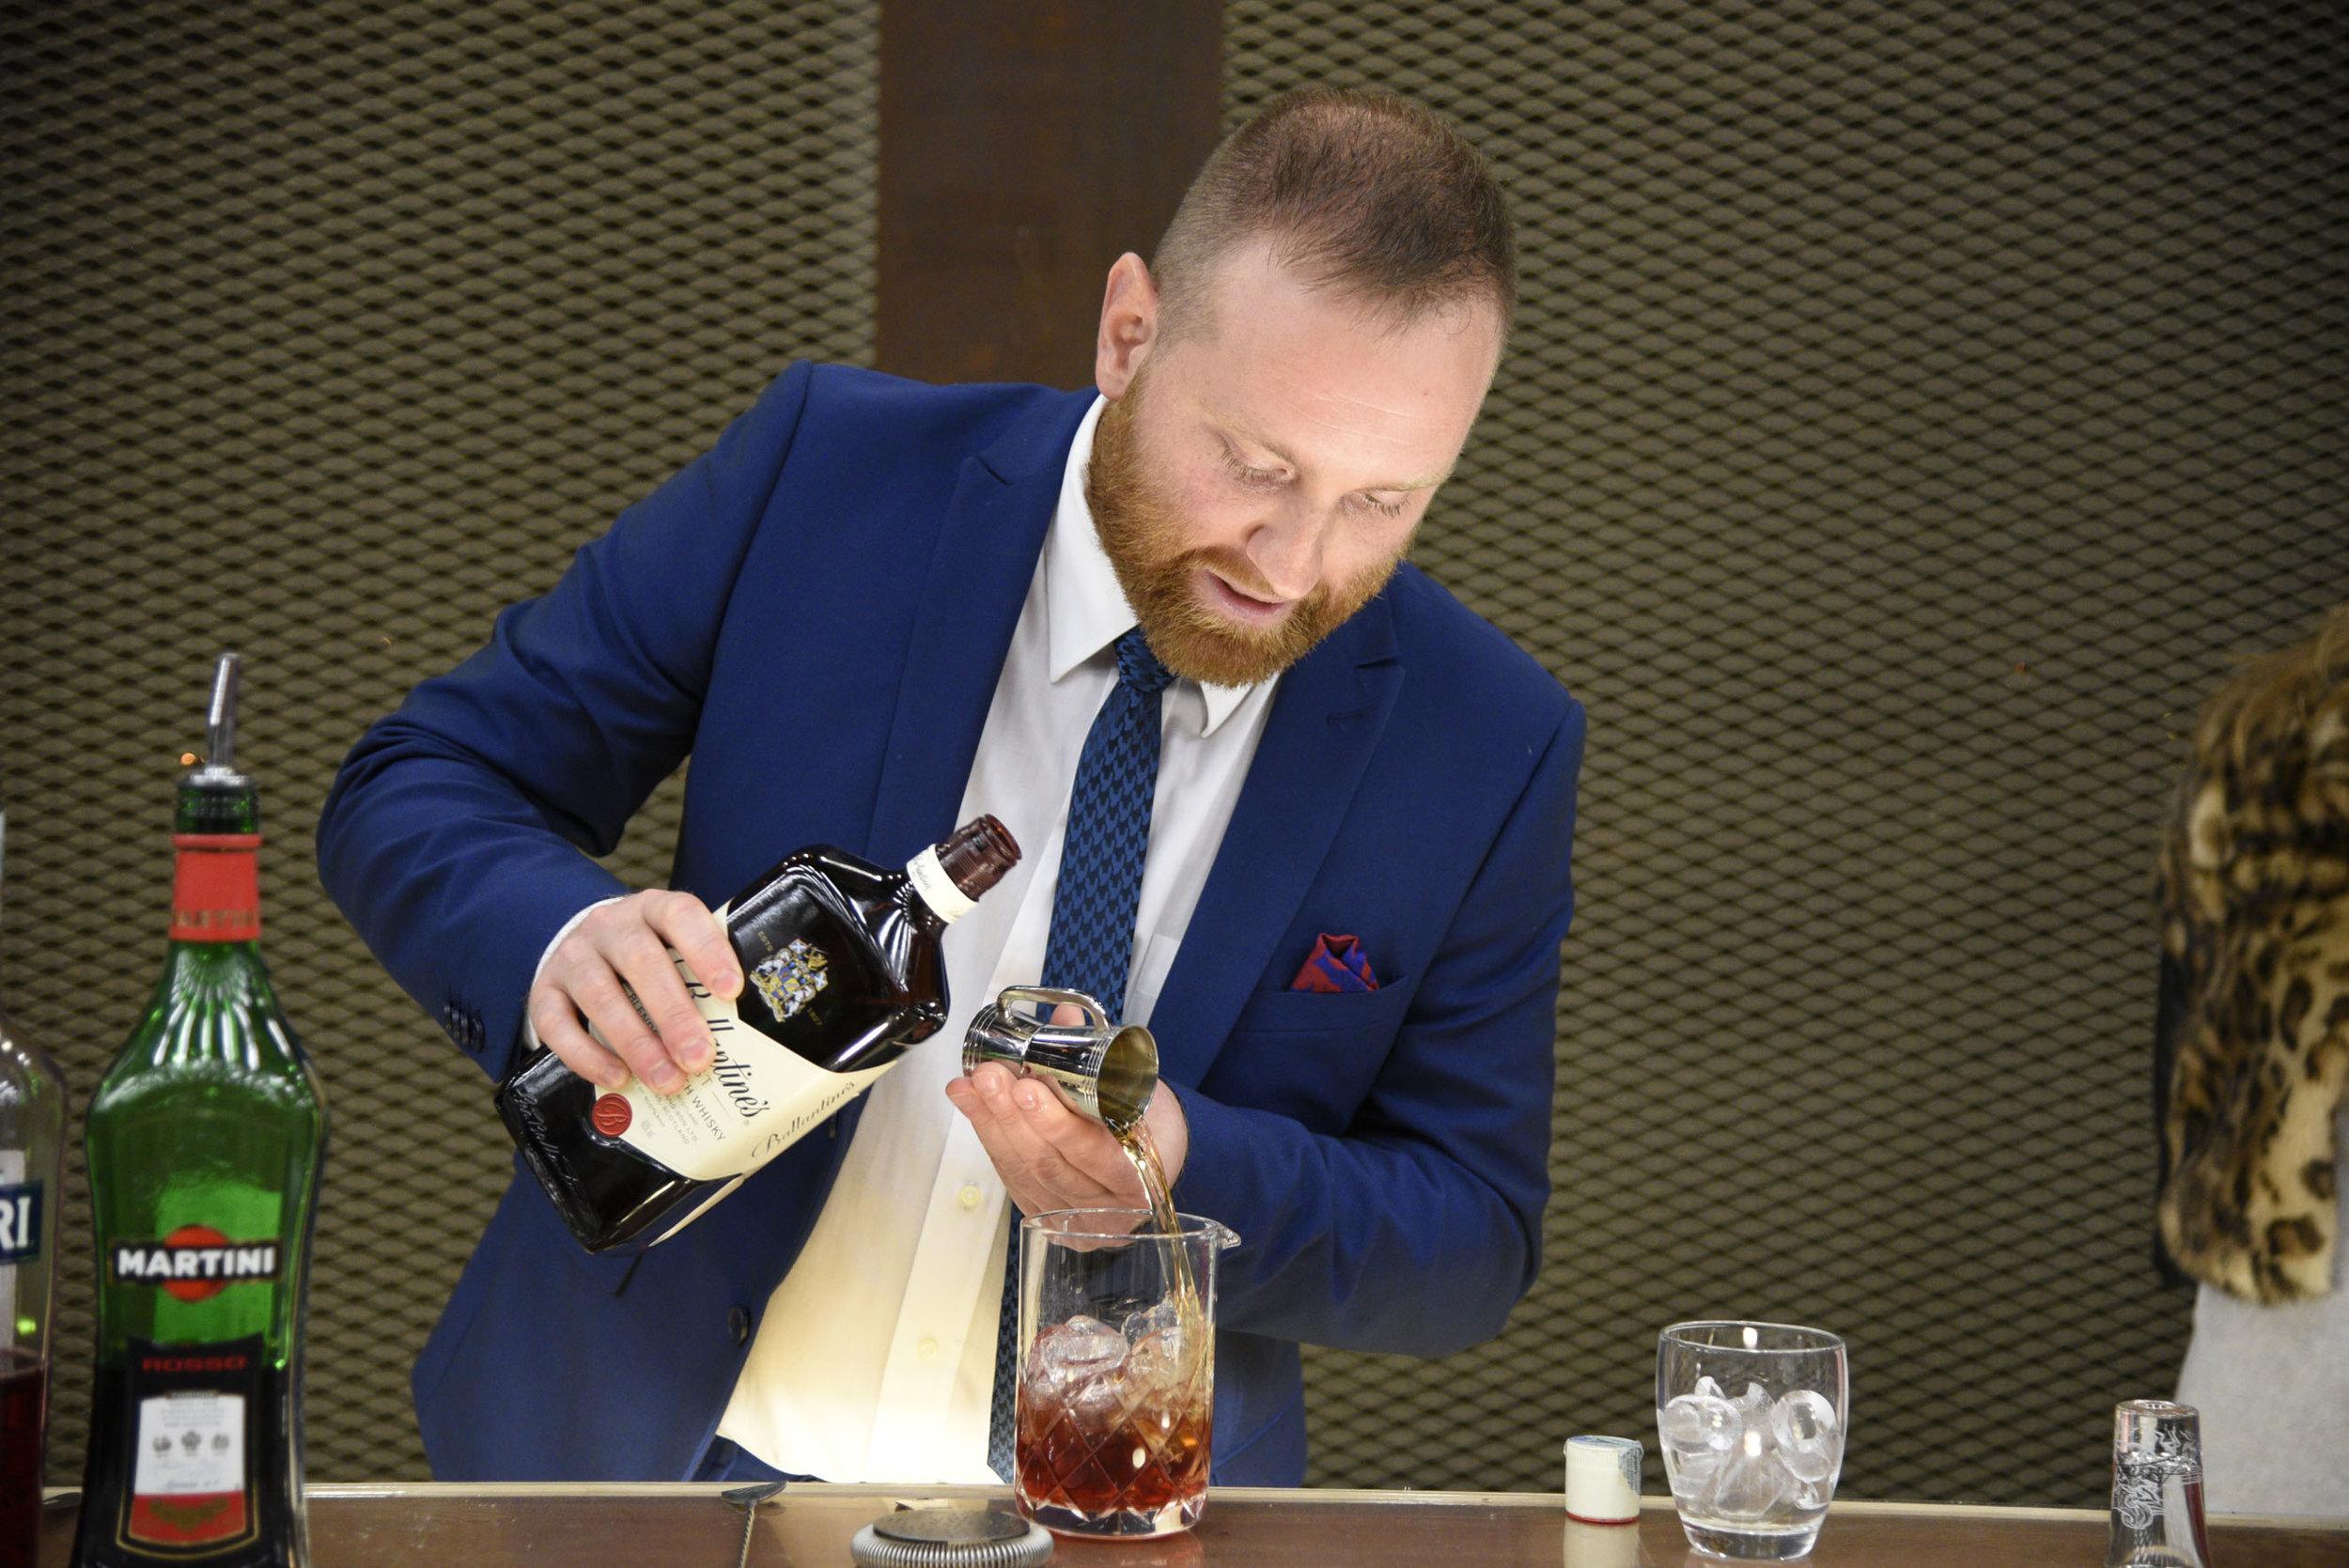 Luca versa il whisky nel mixing glass (foto Toney)